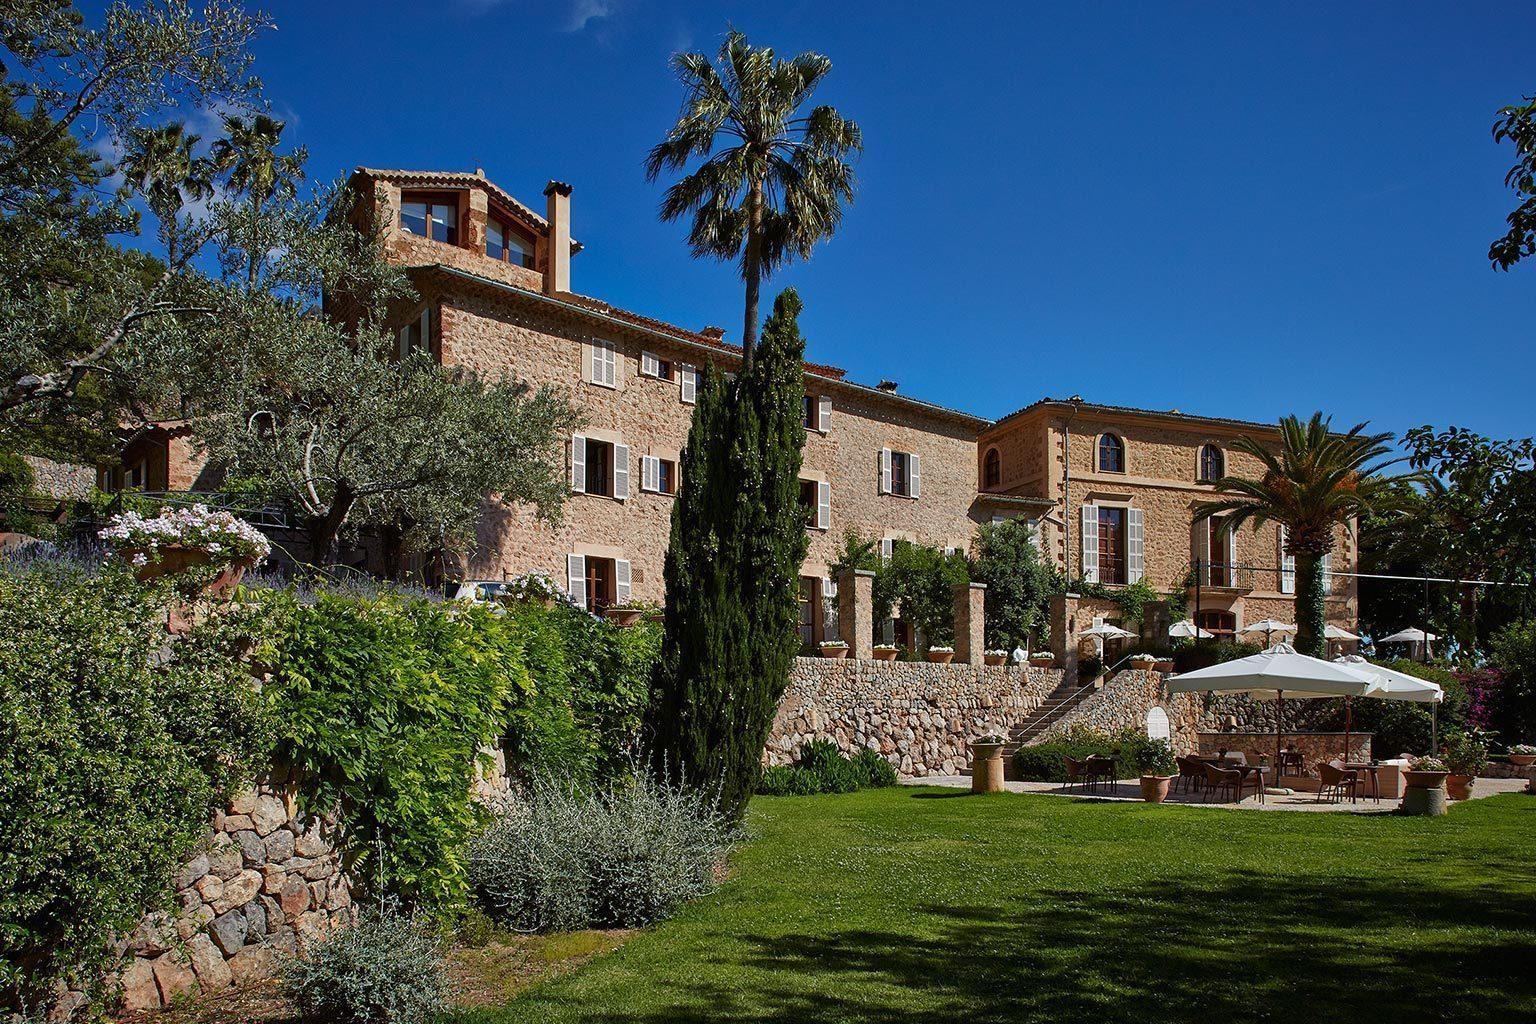 Belmond la residencia luxushotels bei designreisen - Residencia de manila swimming pool ...